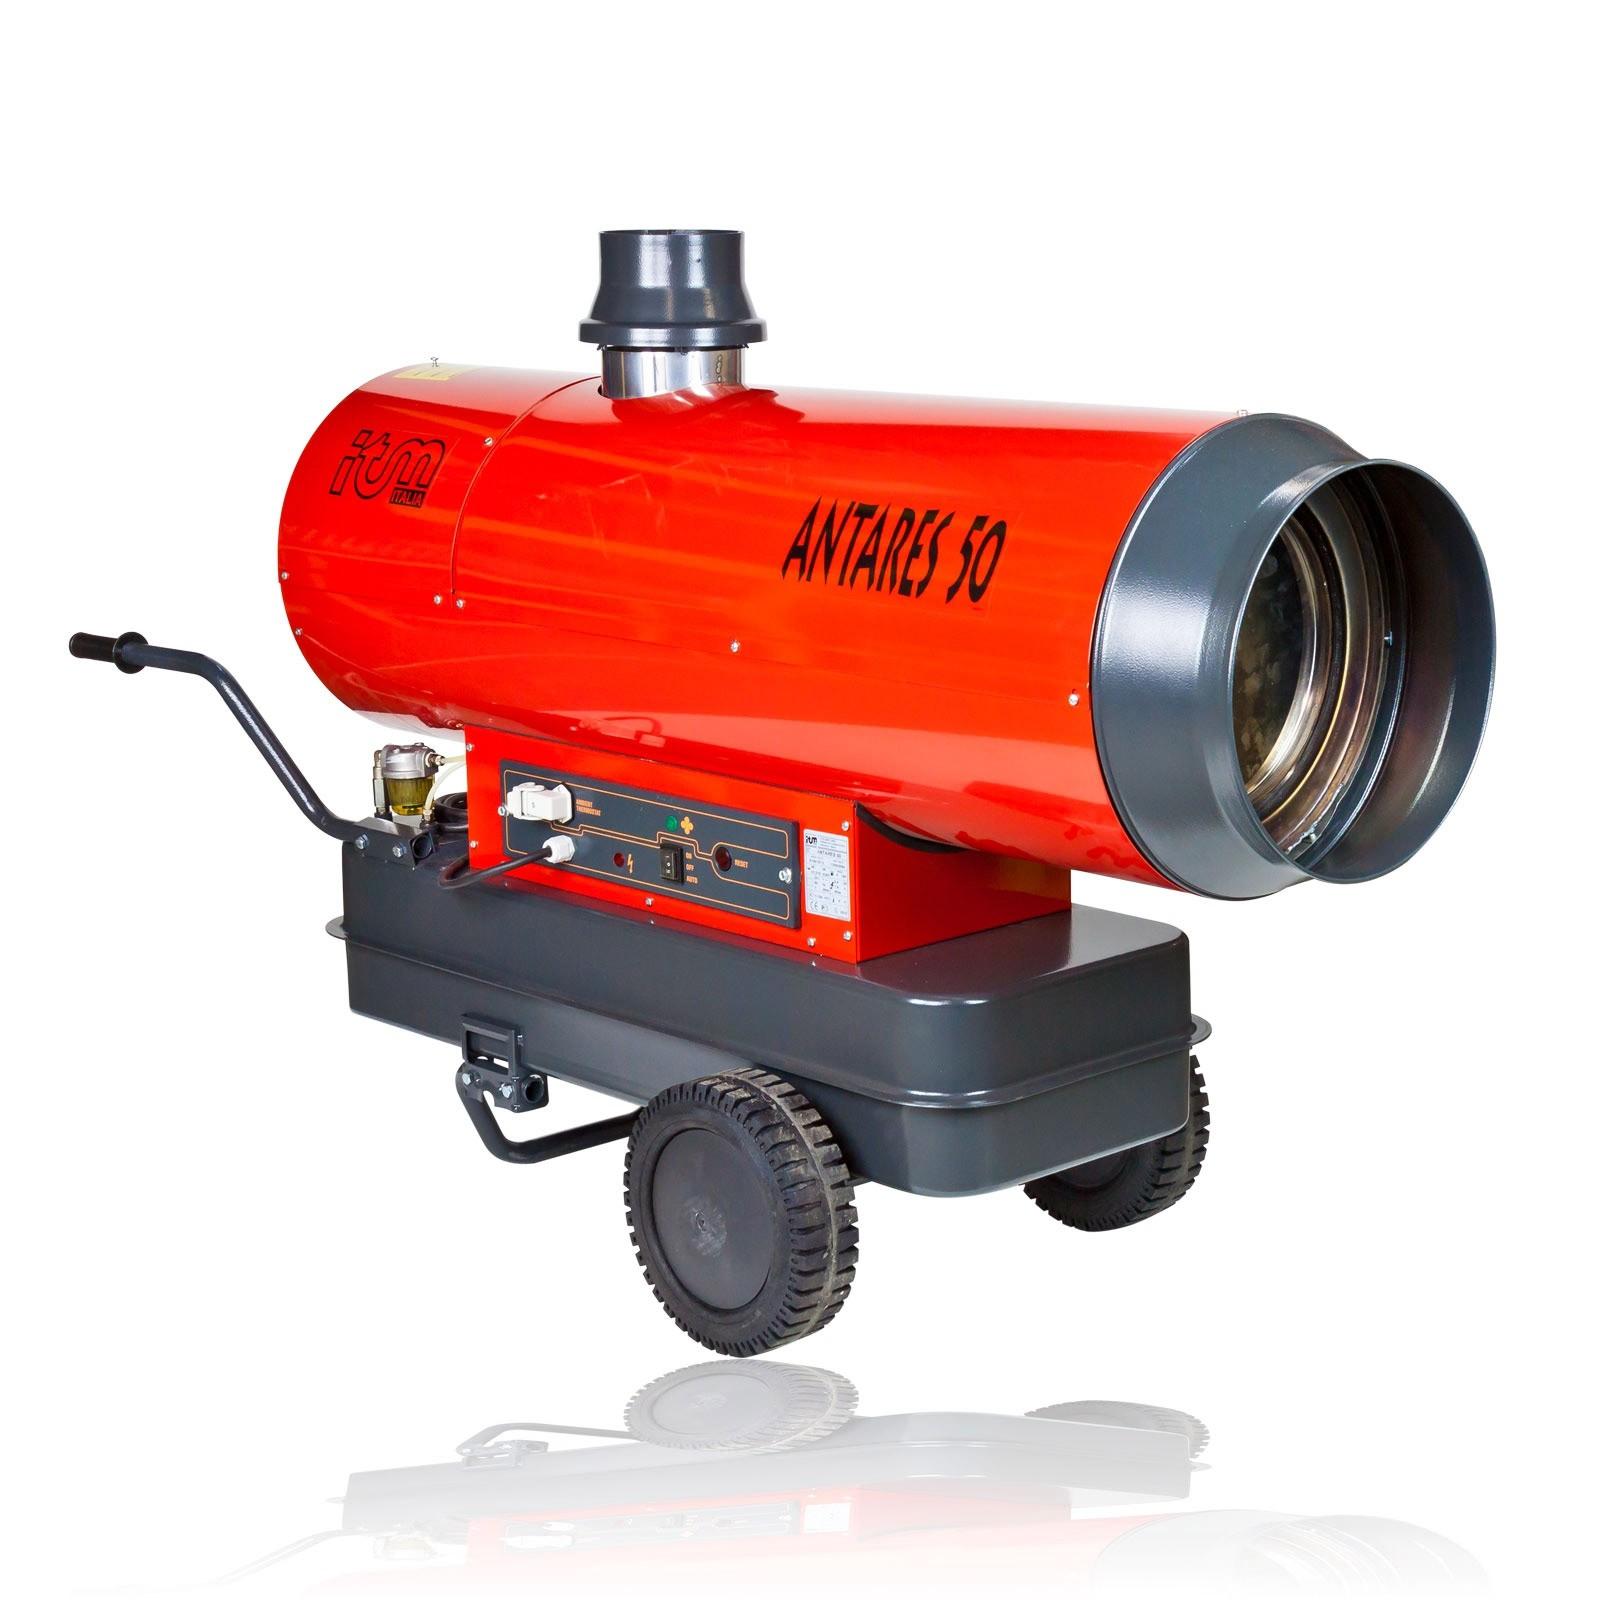 Stabilo-Sanitaer ITM Antares 30 Ölheizer / Heizkanone 30 kW 12352